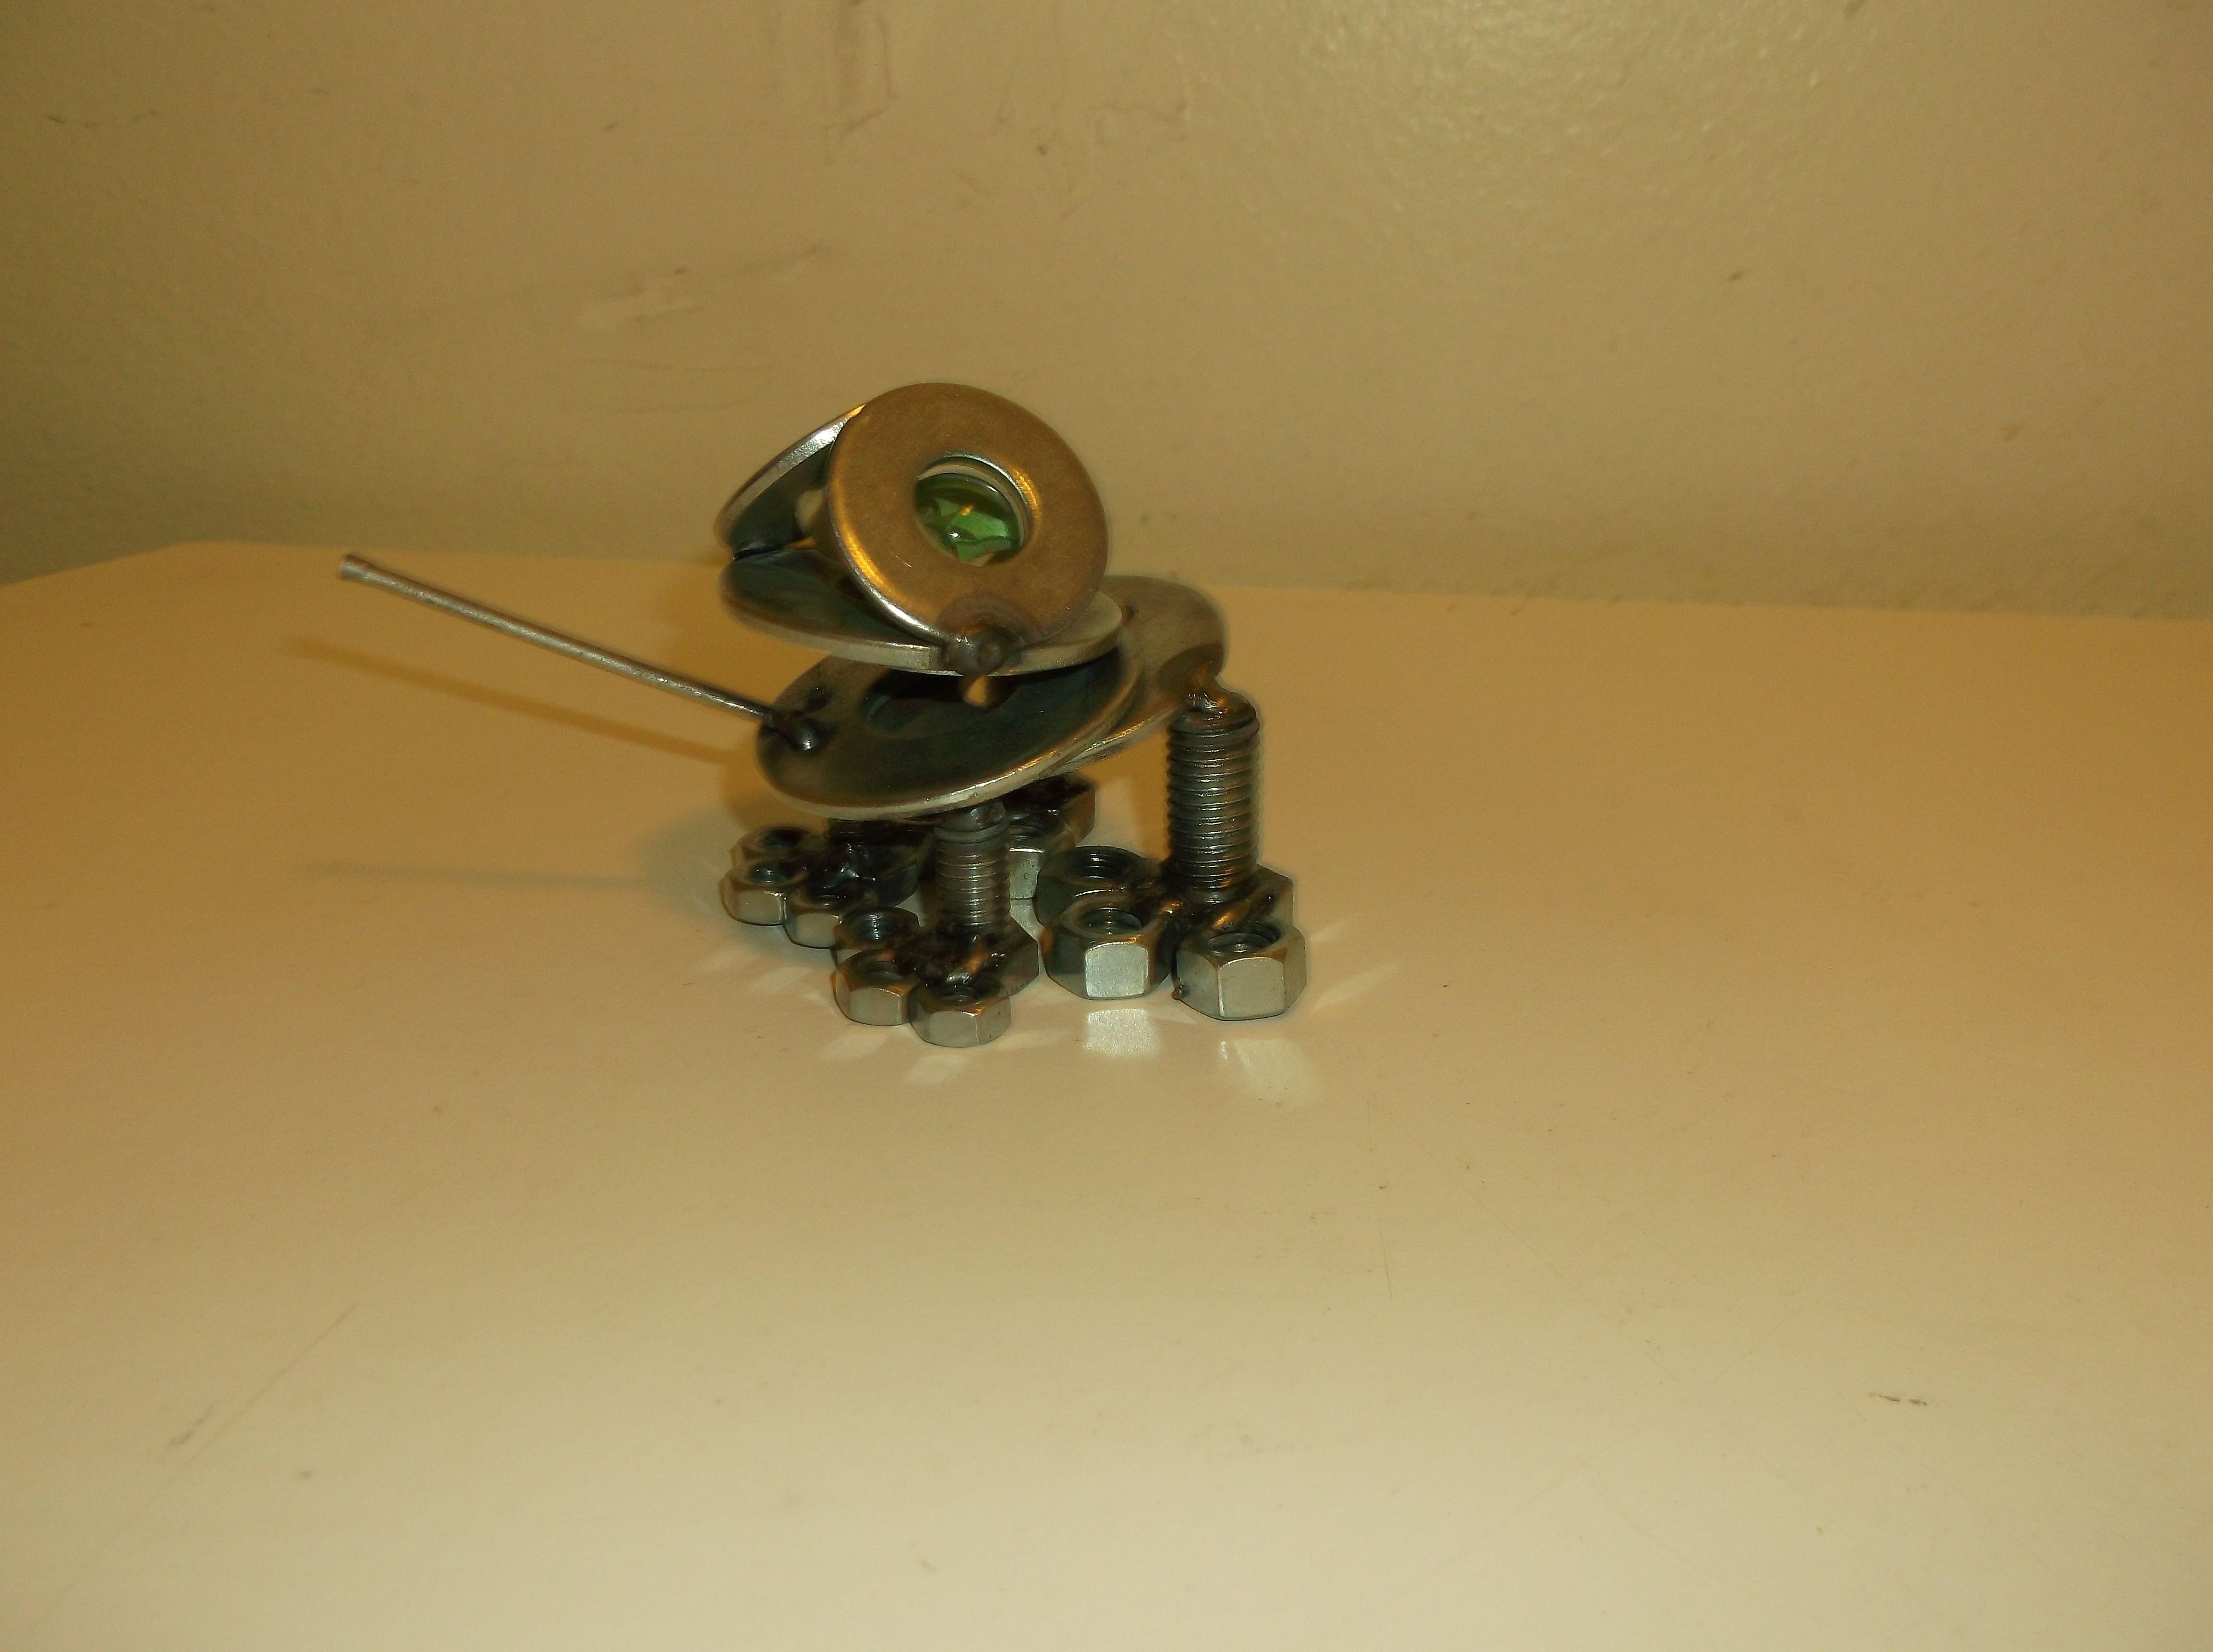 frog, metal frog, frog sculpture, frog art, frog gift, handmade frog ...